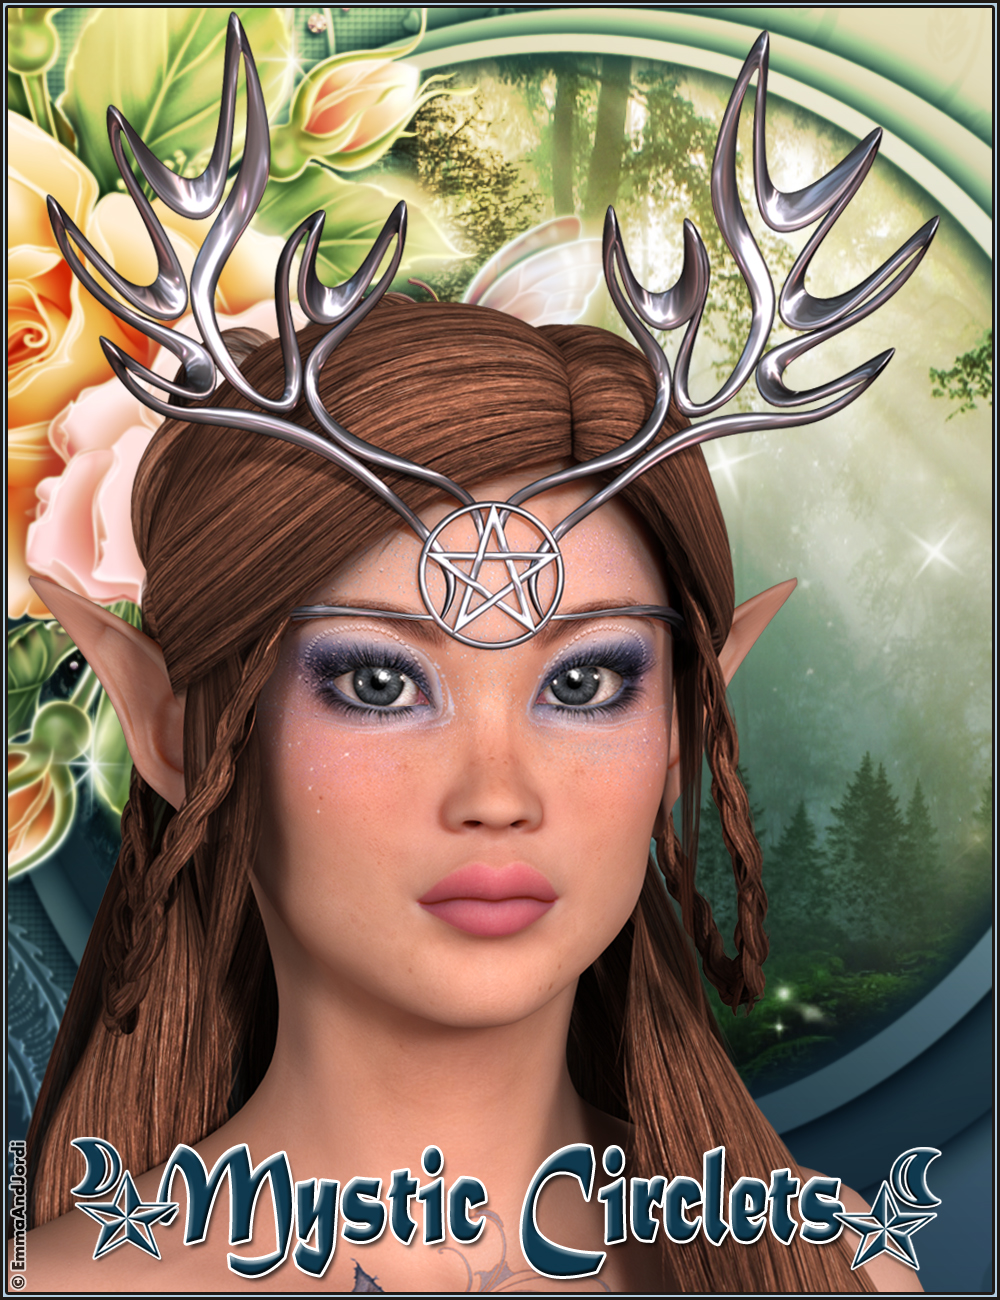 Mystic Circlets For Any Figure by: EmmaAndJordi, 3D Models by Daz 3D